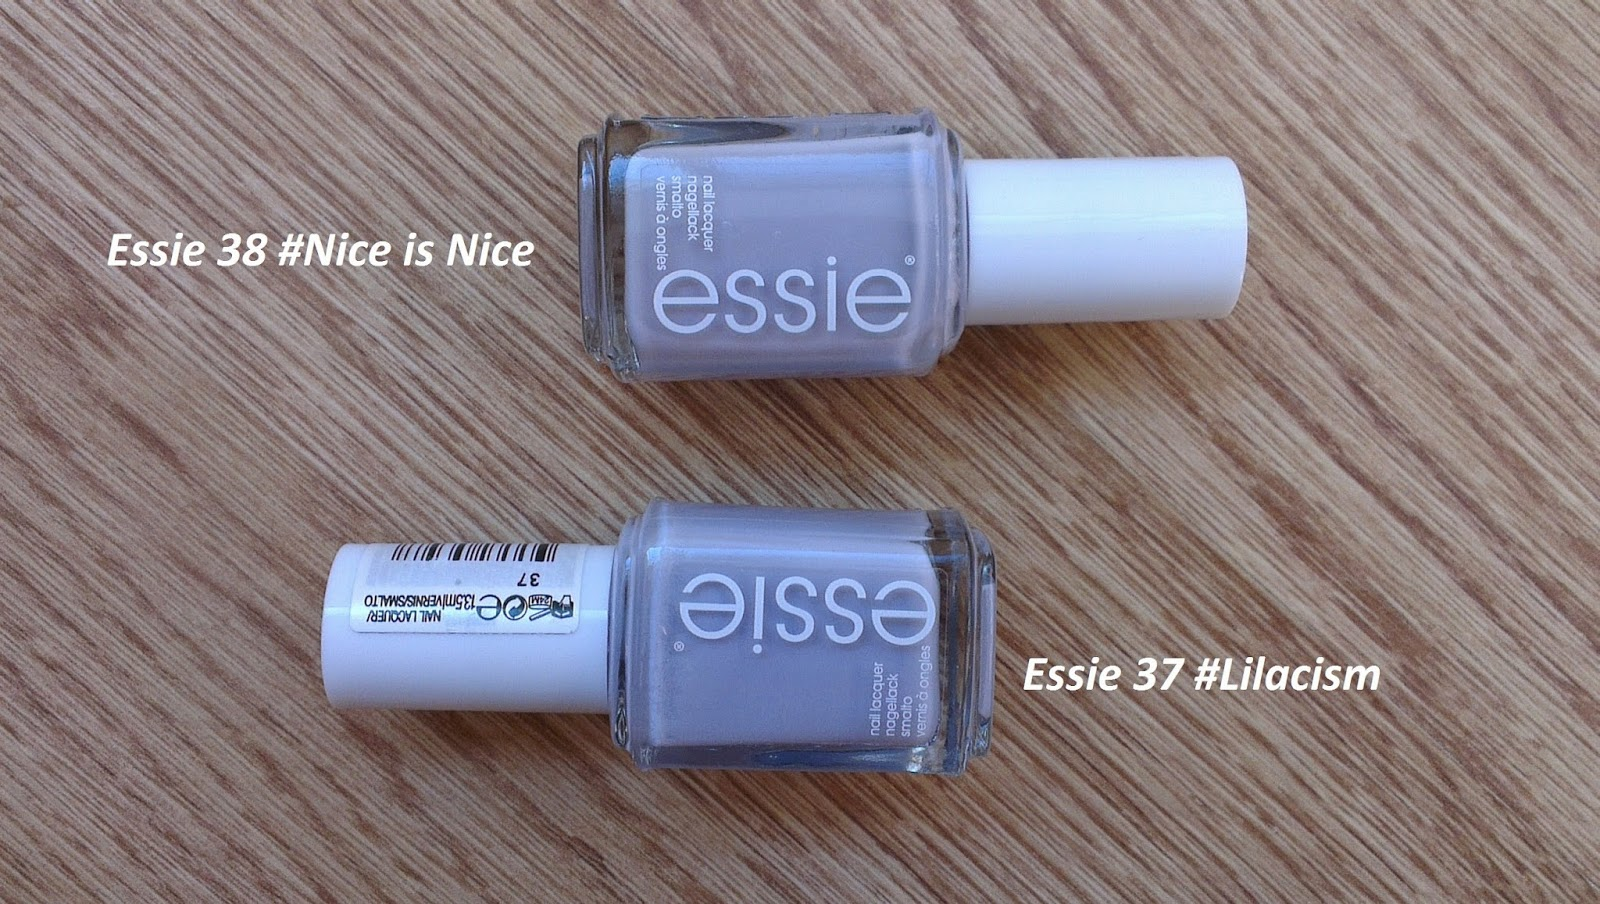 Aesthetic Tips: И снова Essie! Красавцы: Eternal Optimist ...